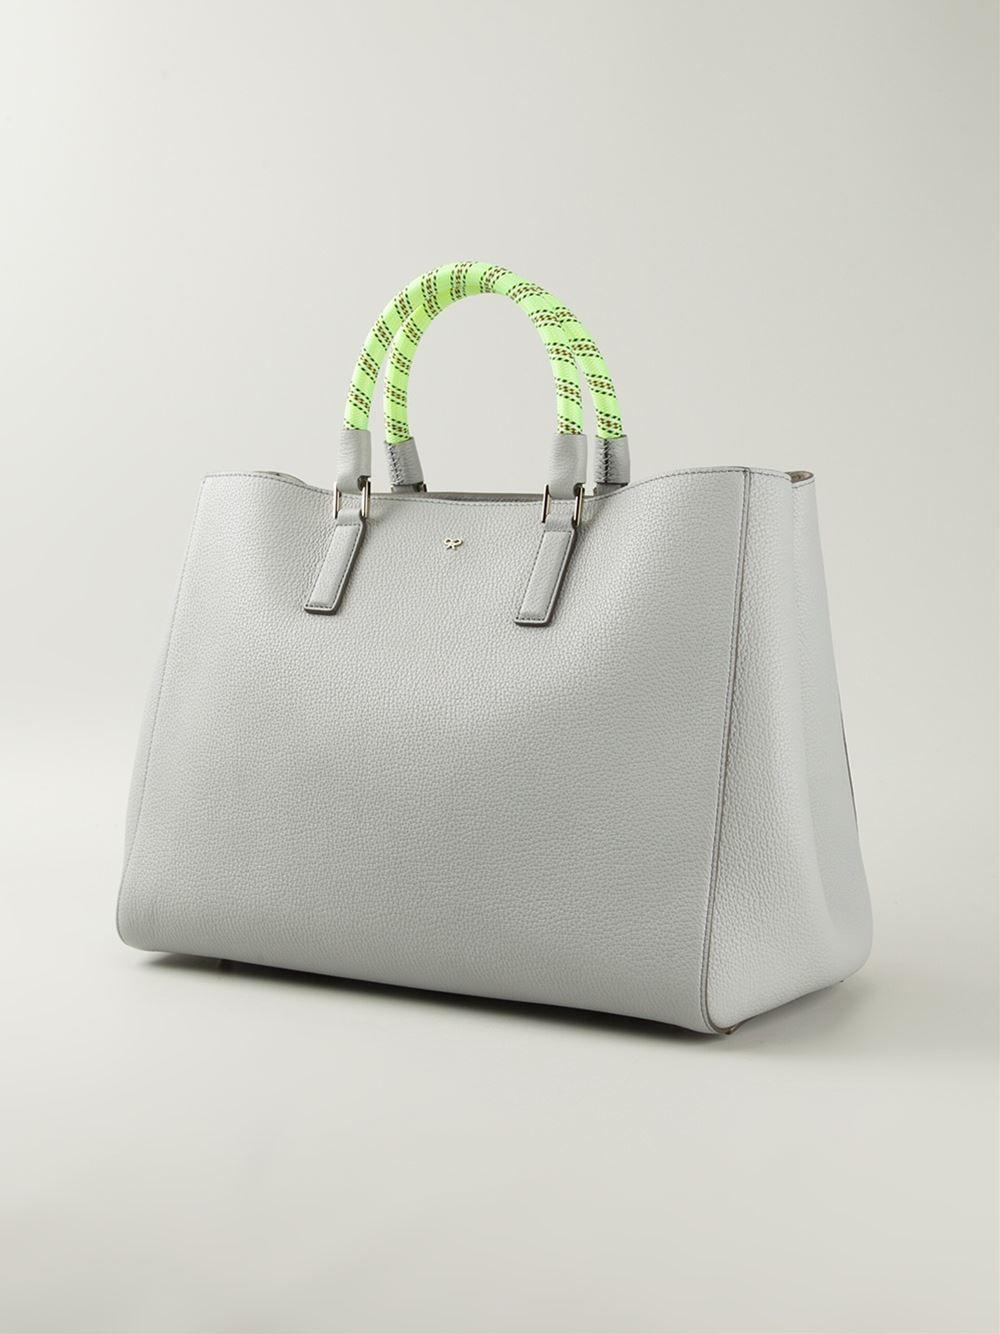 http://www.farfetch.com/mx/shopping/women/anya-hindmarch-large-side-smiley-featherweight-ebury-tote-item-10930659.aspx?storeid=9516